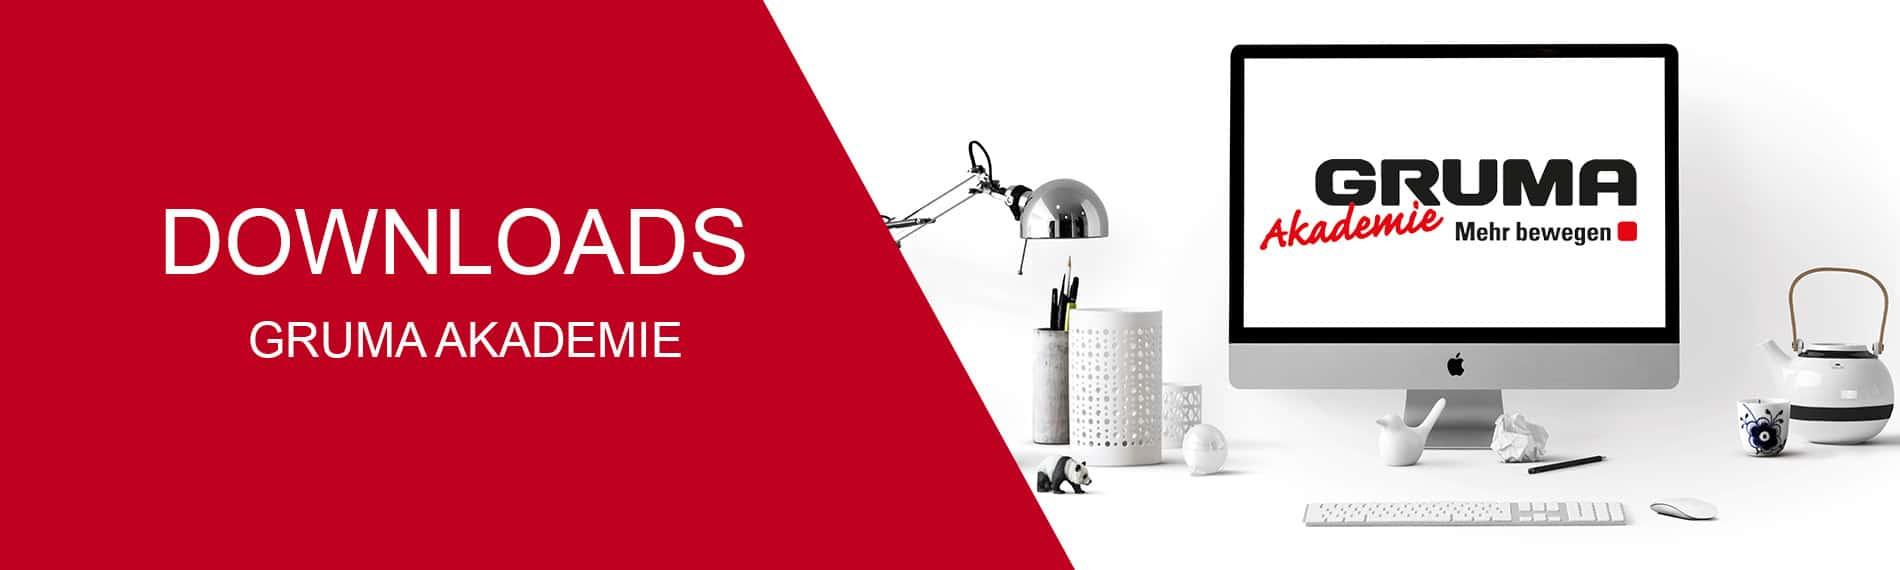 header desktop downloads gruma akademie 1